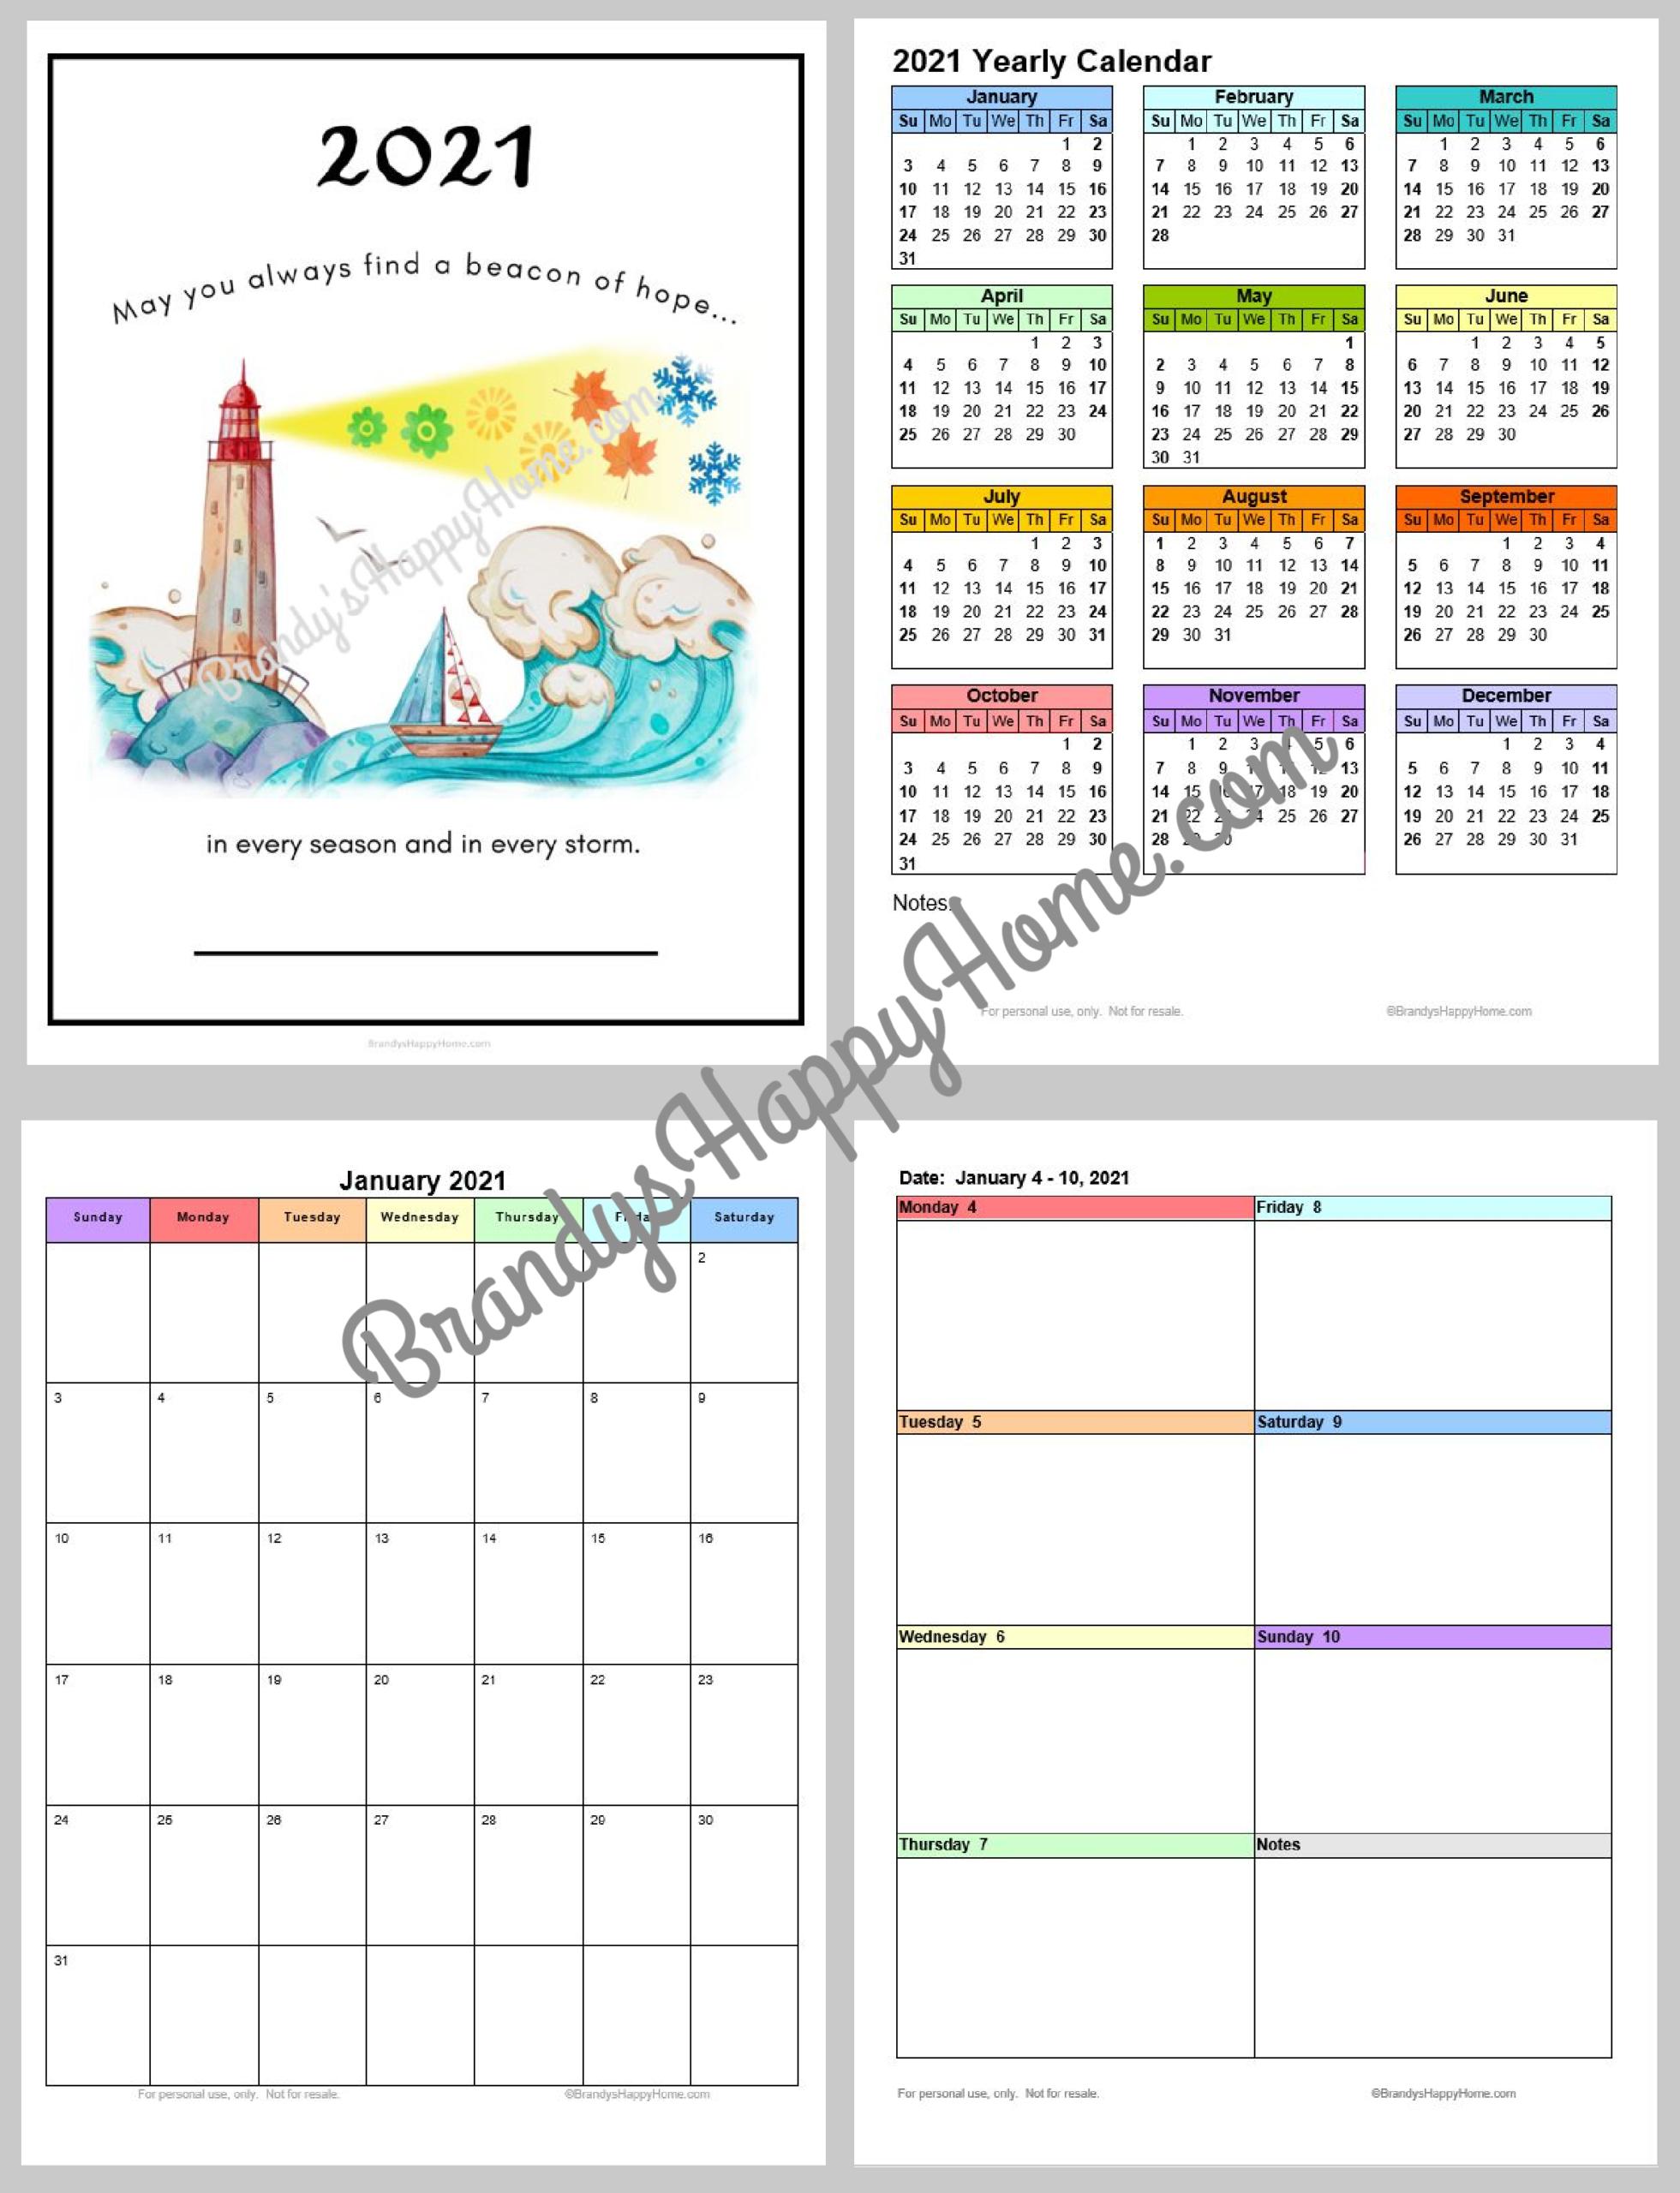 Free 2021 Calendar Planner Printables intended for Pocket Calendar Printable 2021